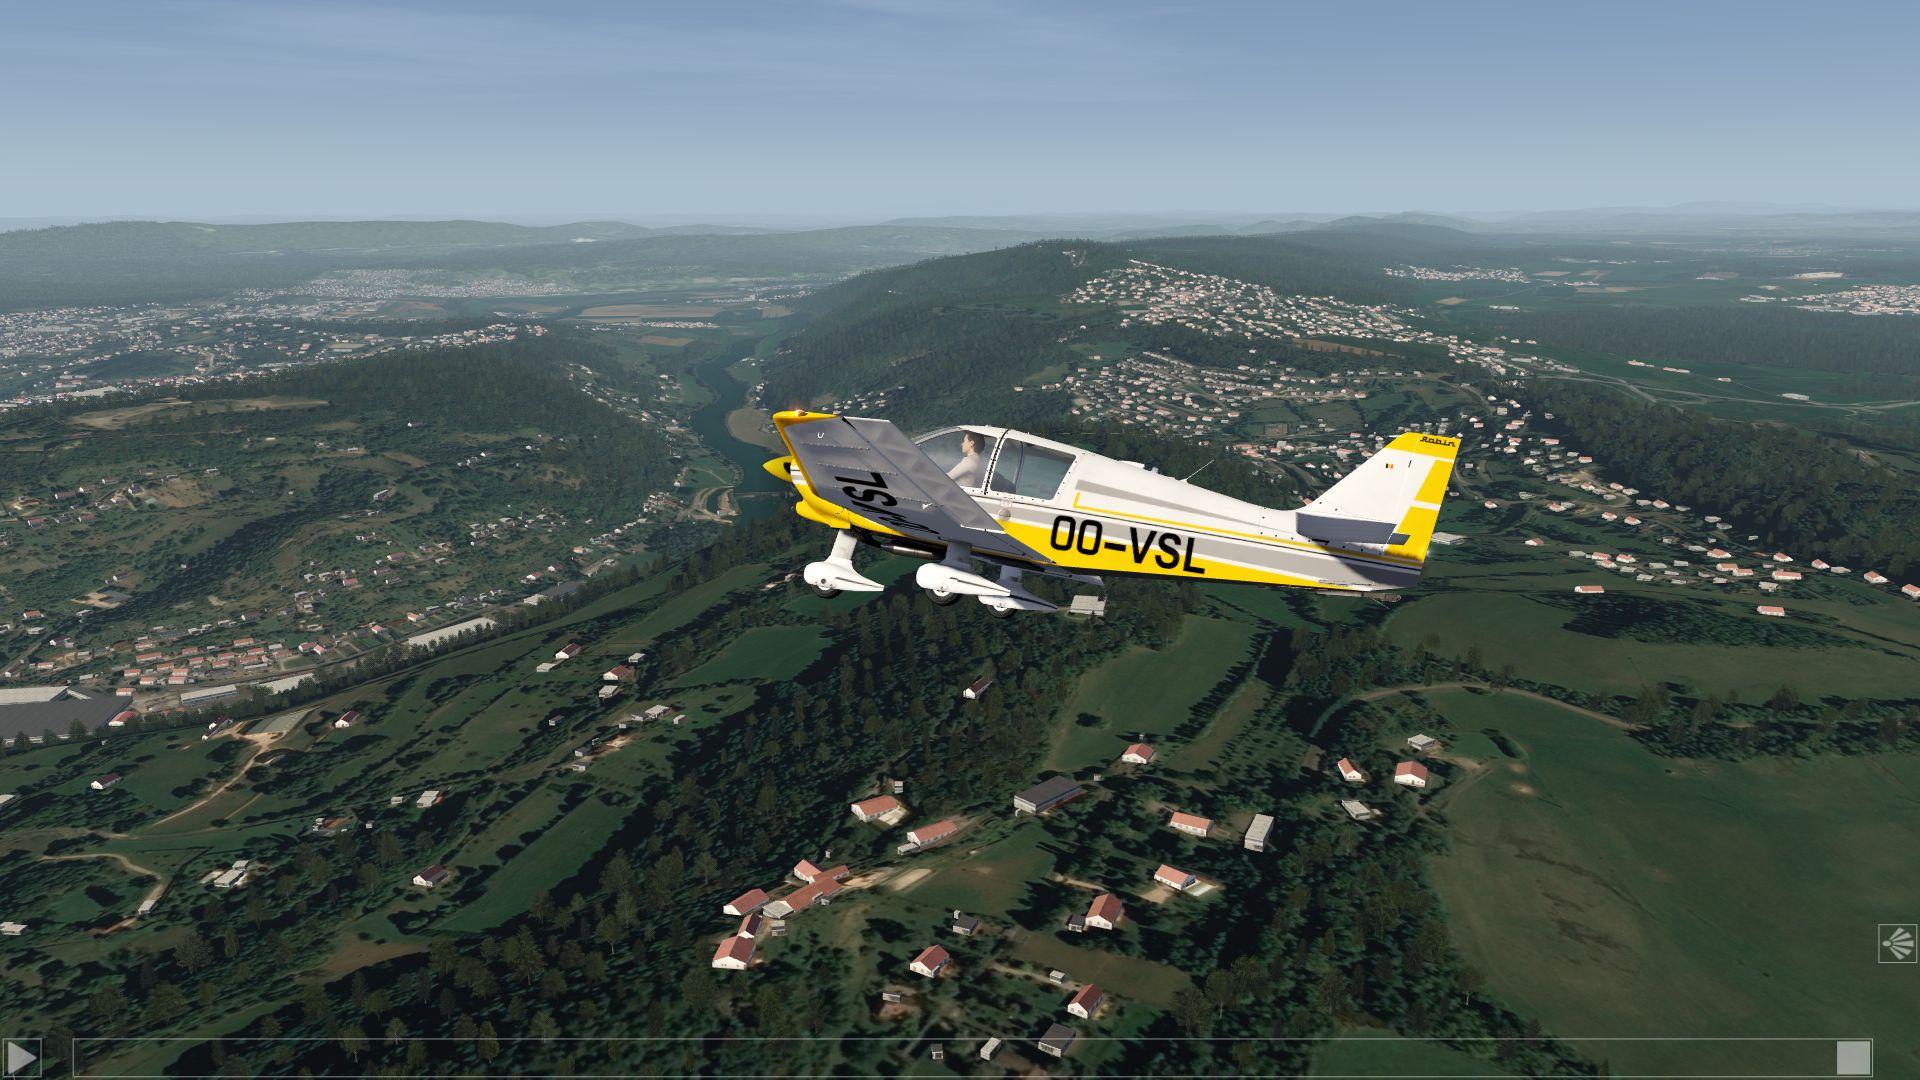 http://www.pilote-virtuel.com/img/gallery/1517173398.jpg